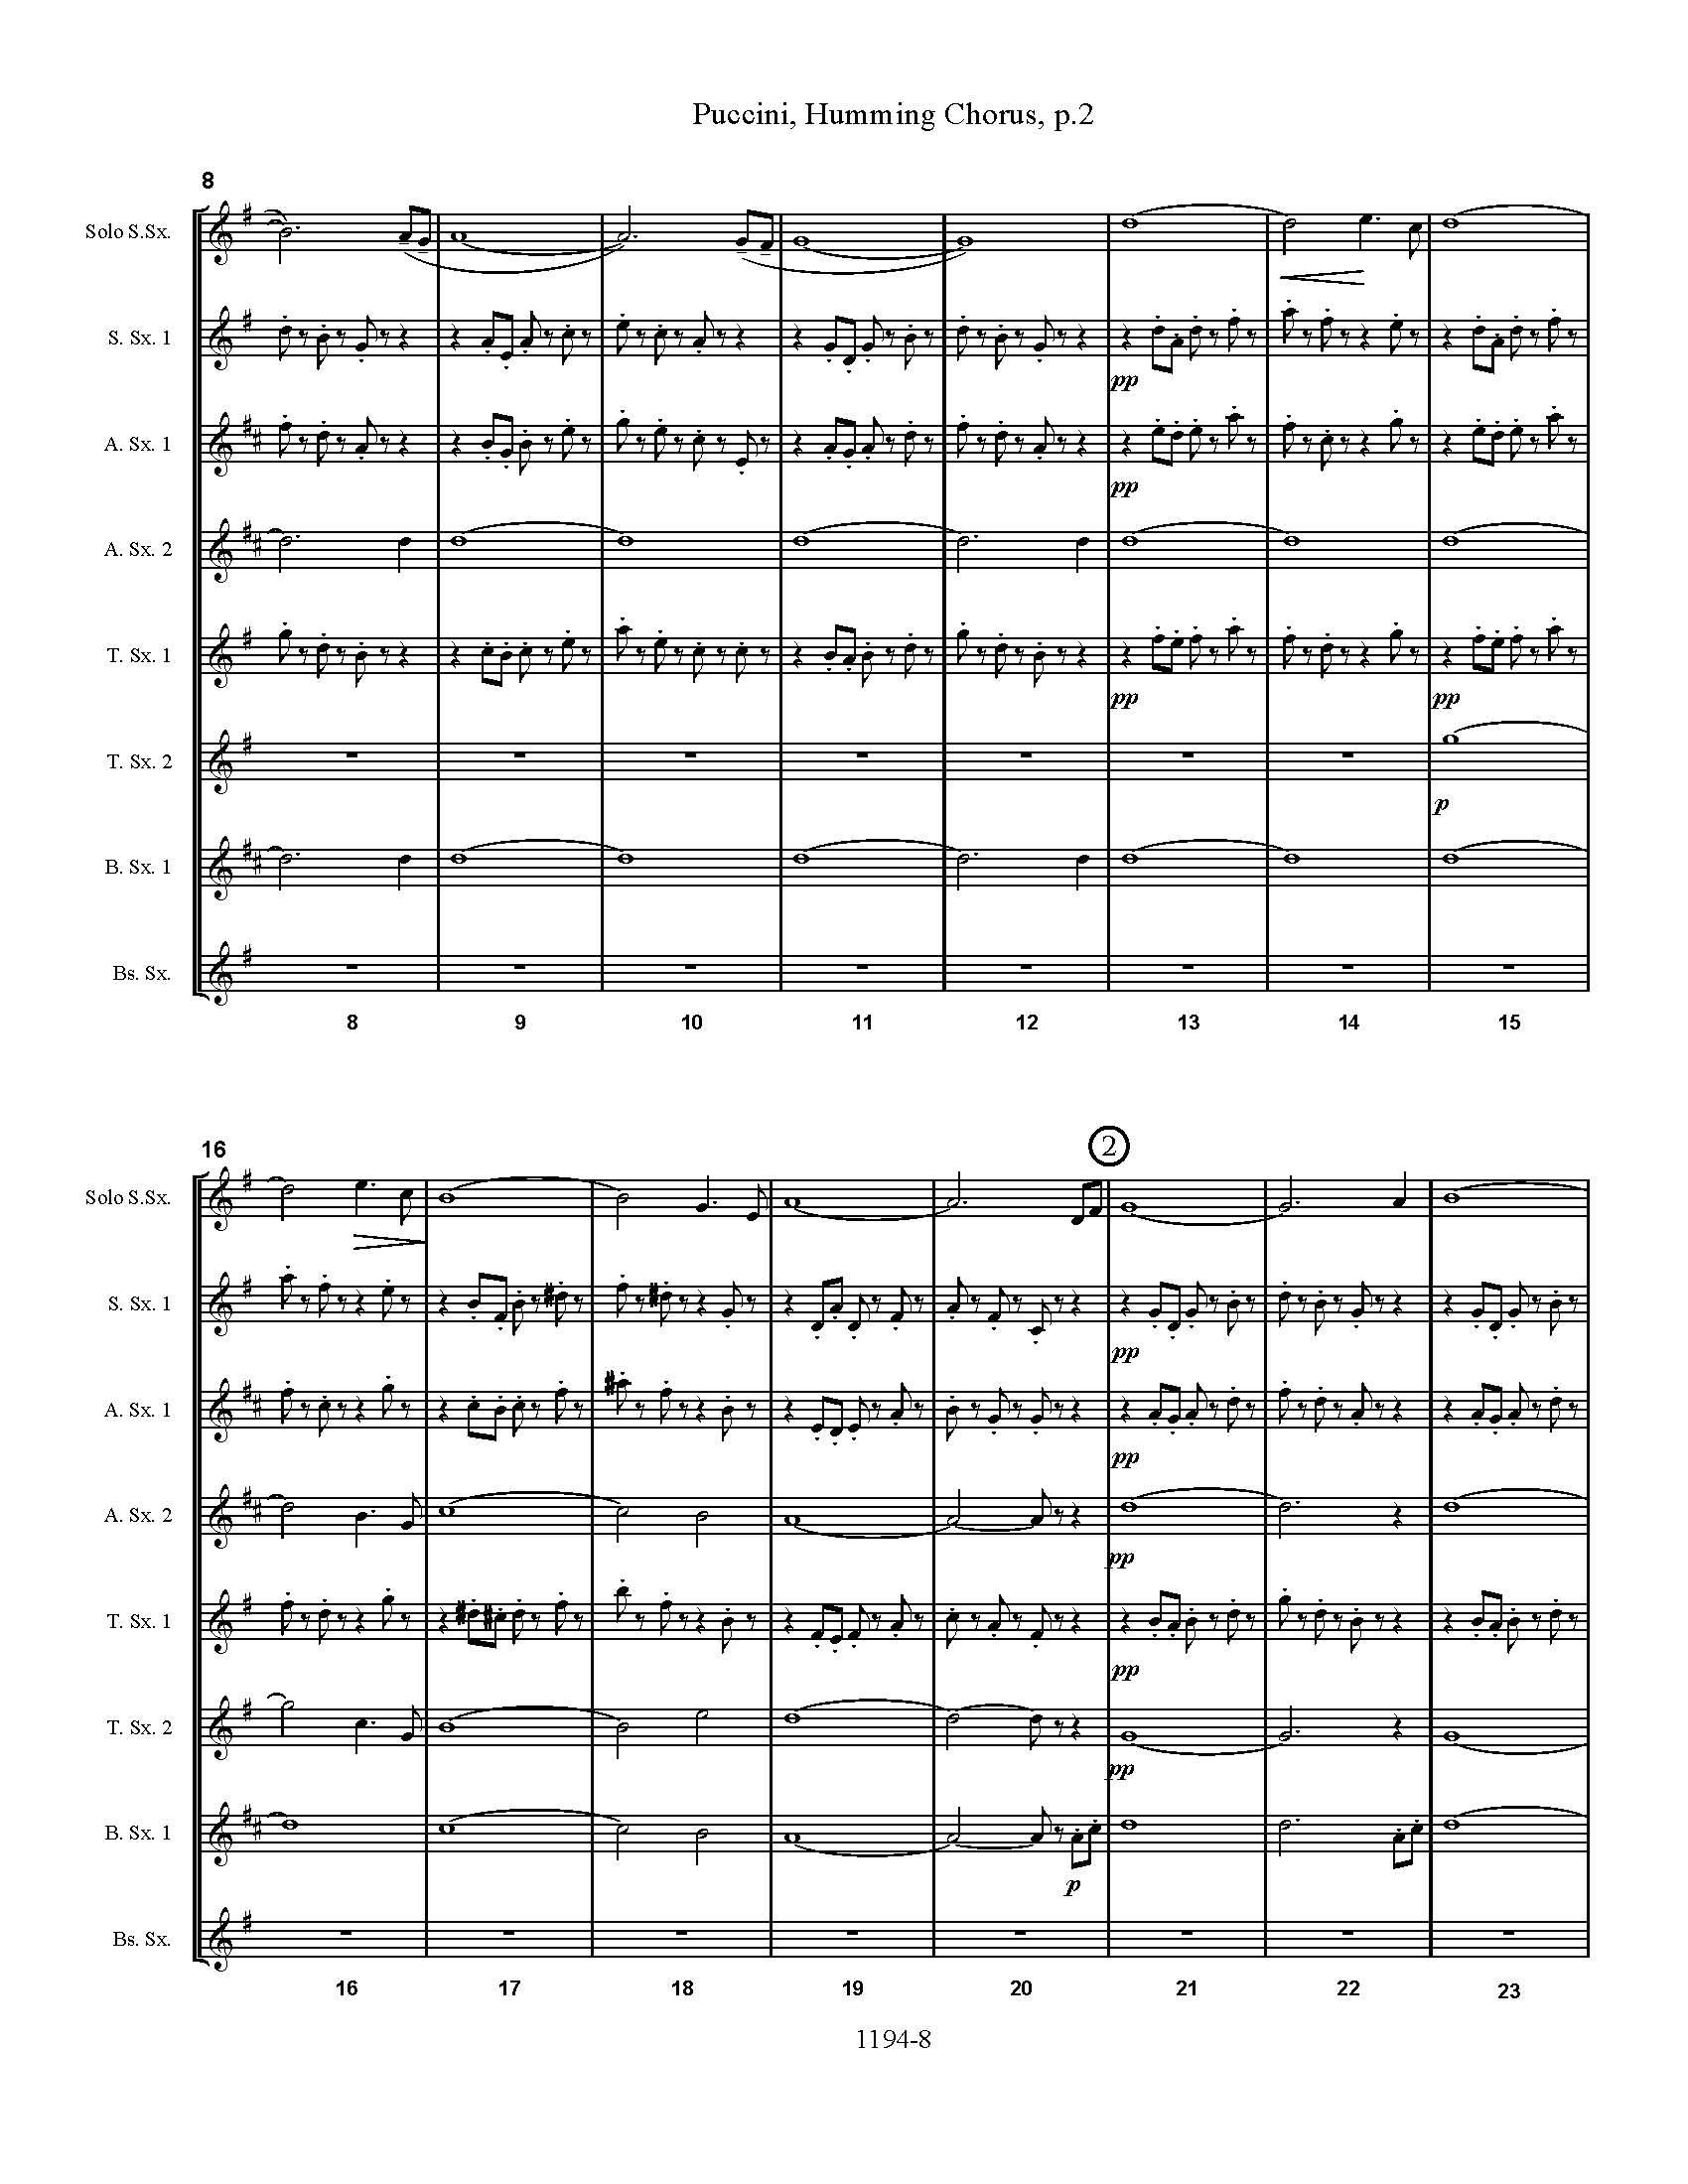 Puccini score